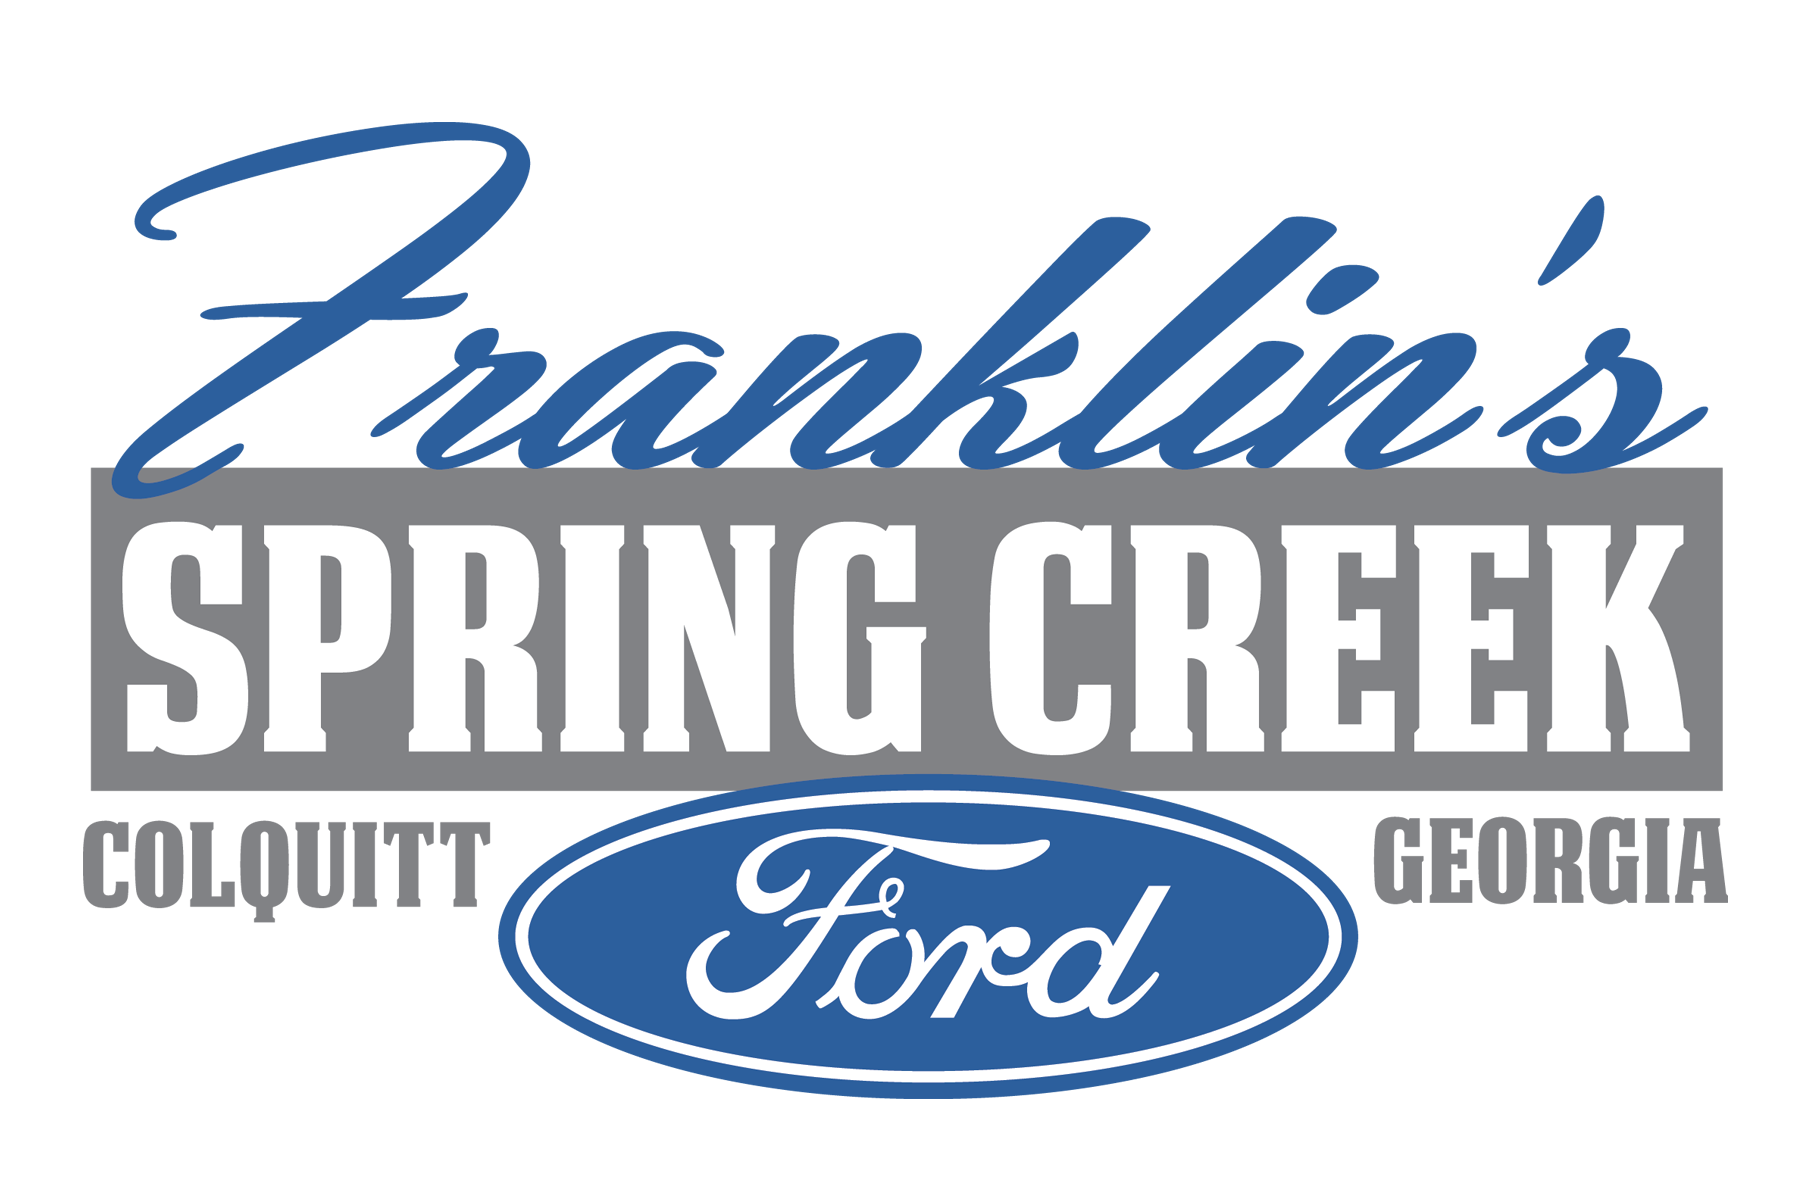 Franklin's Spring Creek Ford